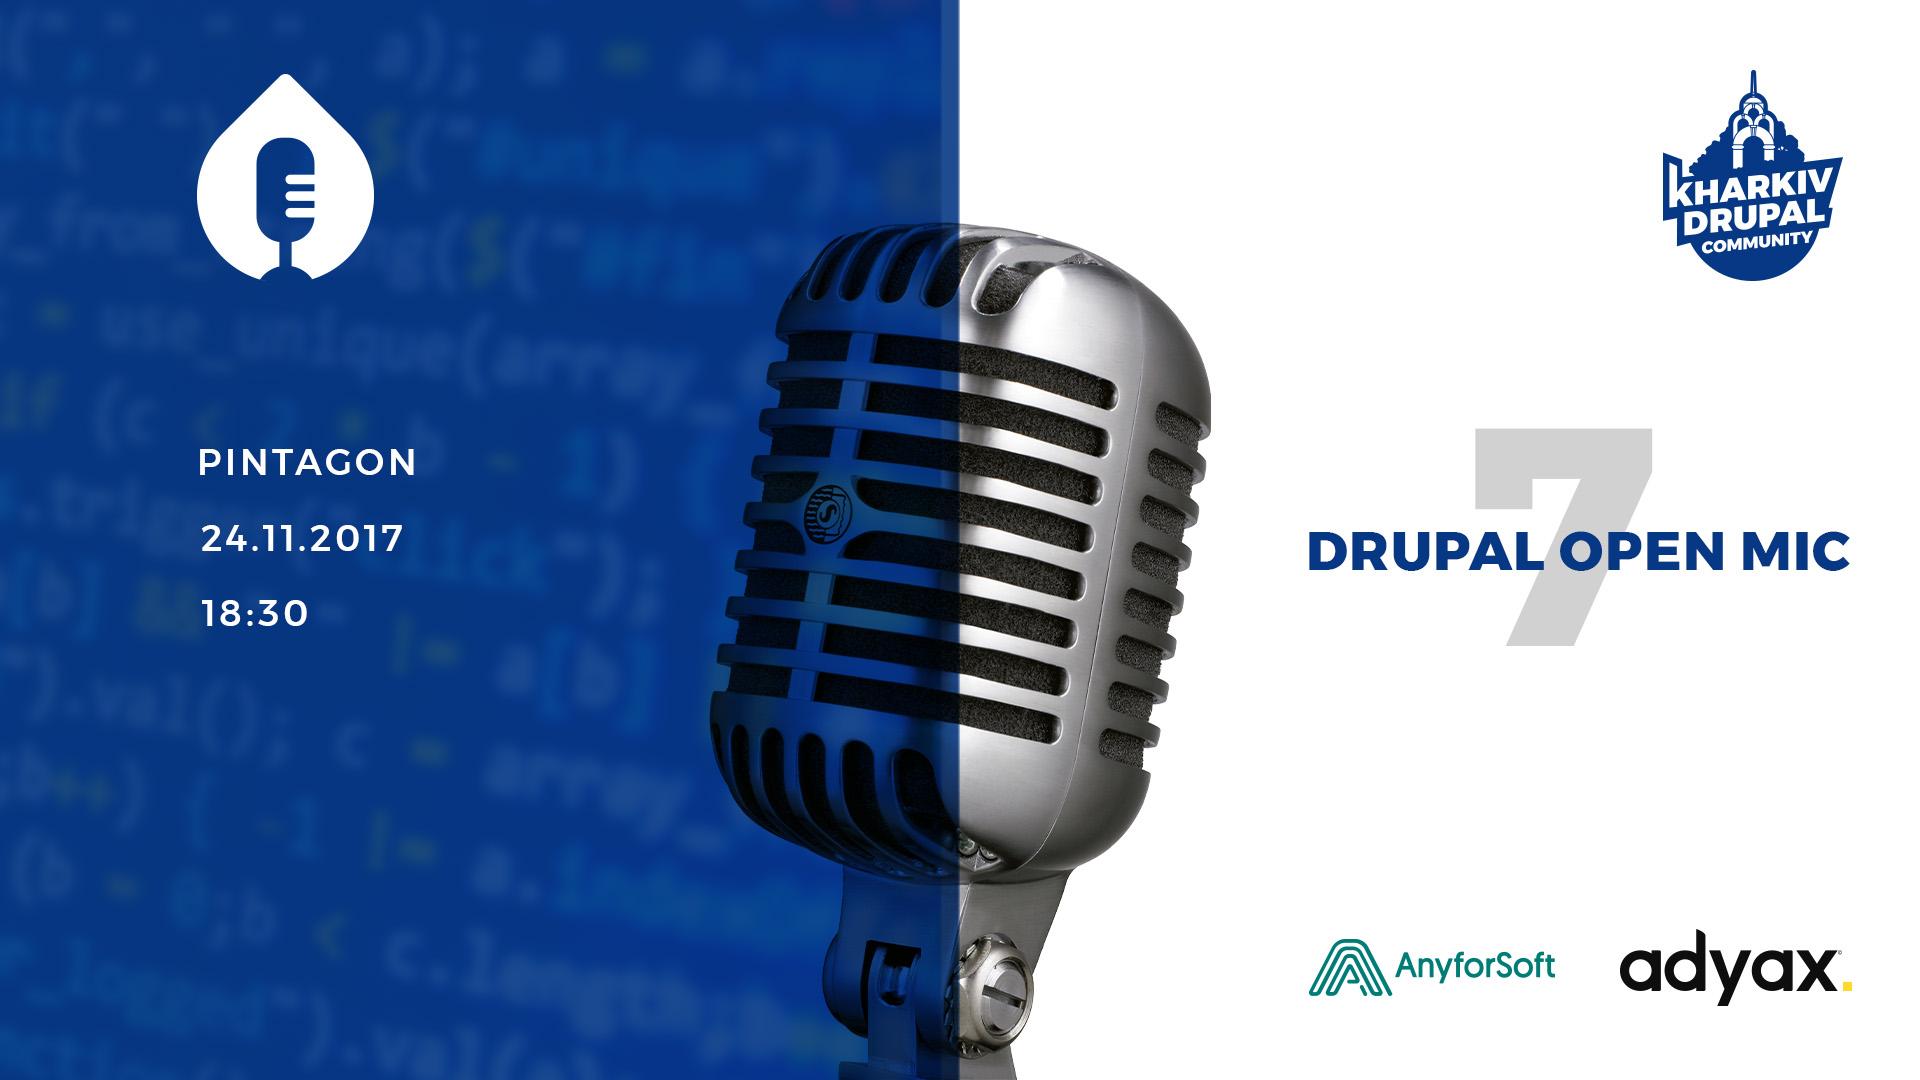 Kharkiv drupal open mic 7 drupal groups kharkiv drupal open mic 7 xflitez Gallery